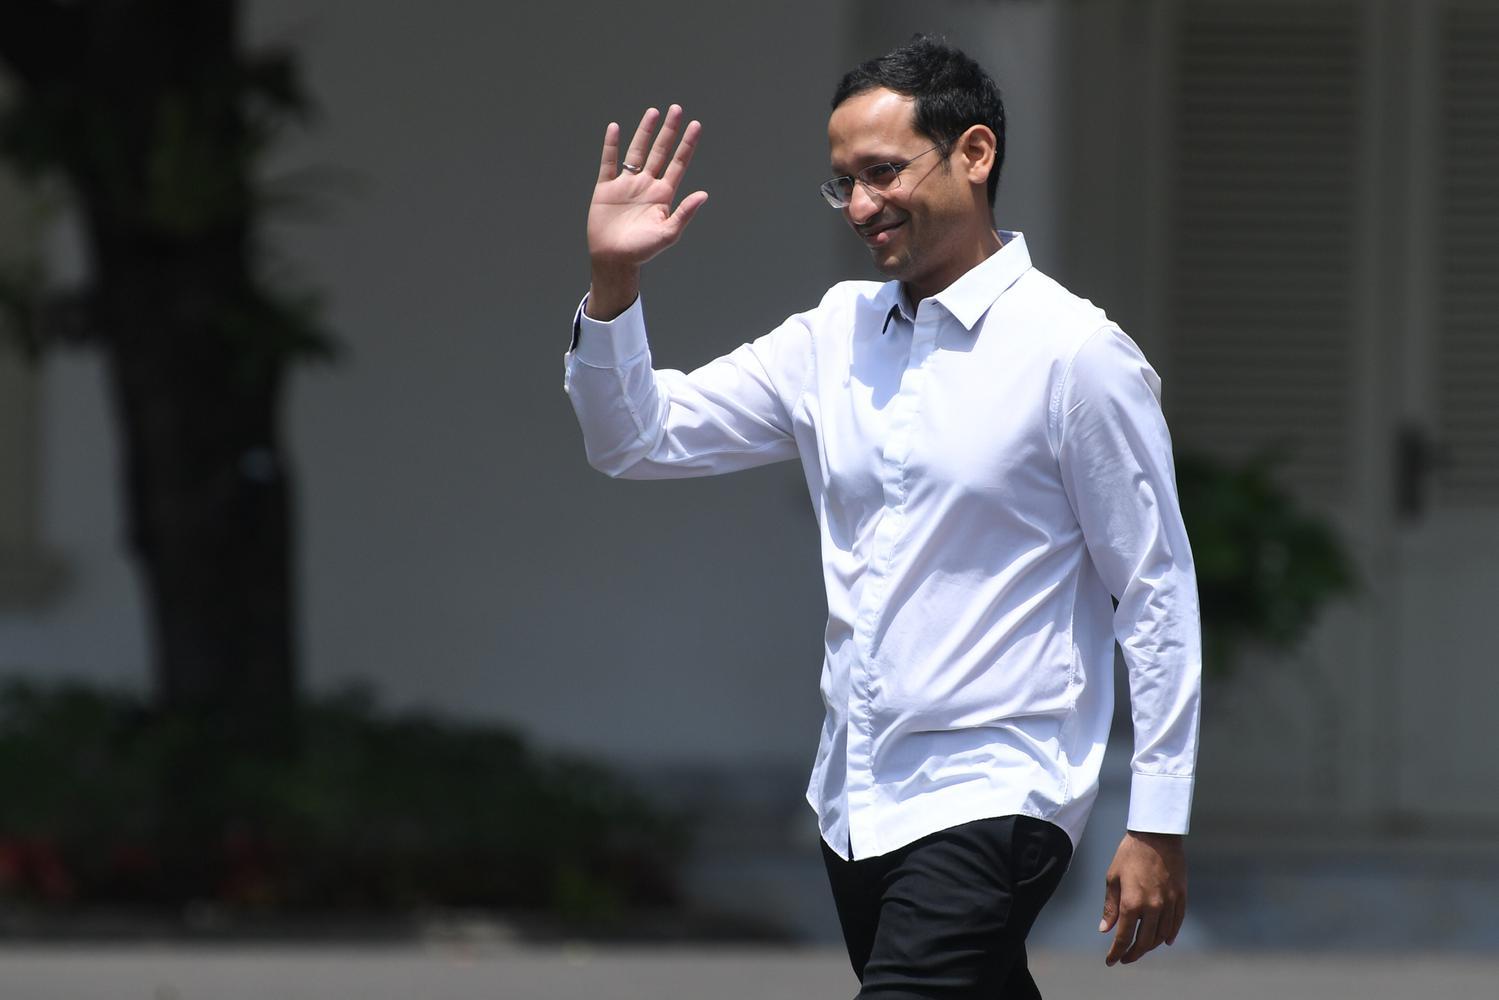 Nadiem Makarim Menteri, Nadiem Menteri, Gojek, Kabinet Jokowi Maruf, Kabinet Baru Jokowi